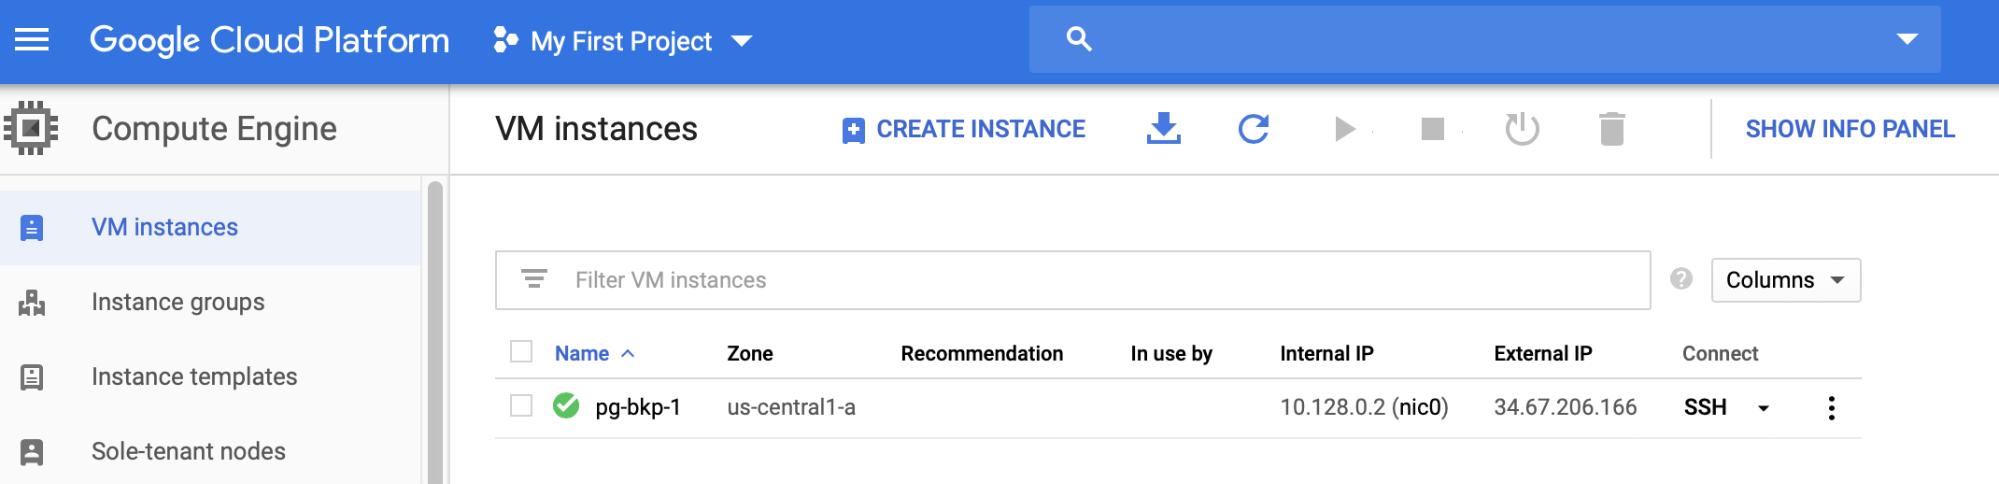 Google Cloud Compute Engine